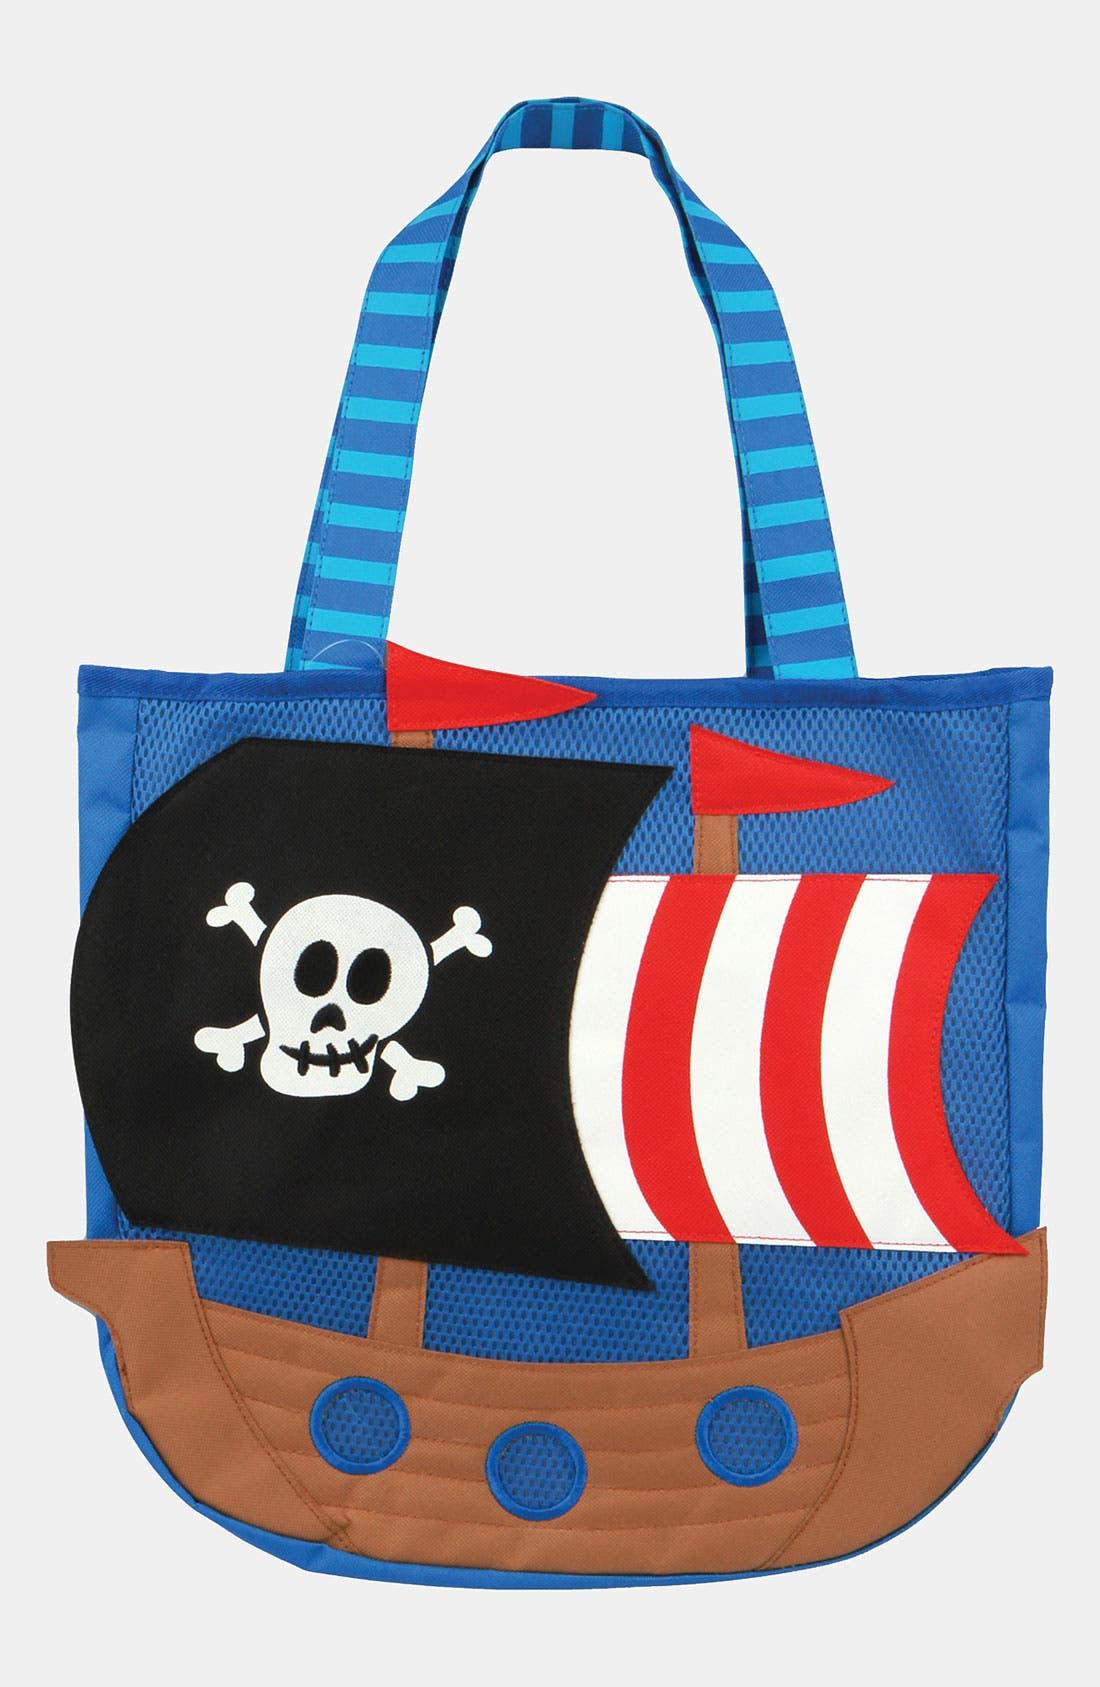 Main Image - Stephen Joseph 'Pirate' Beach Tote & Toys